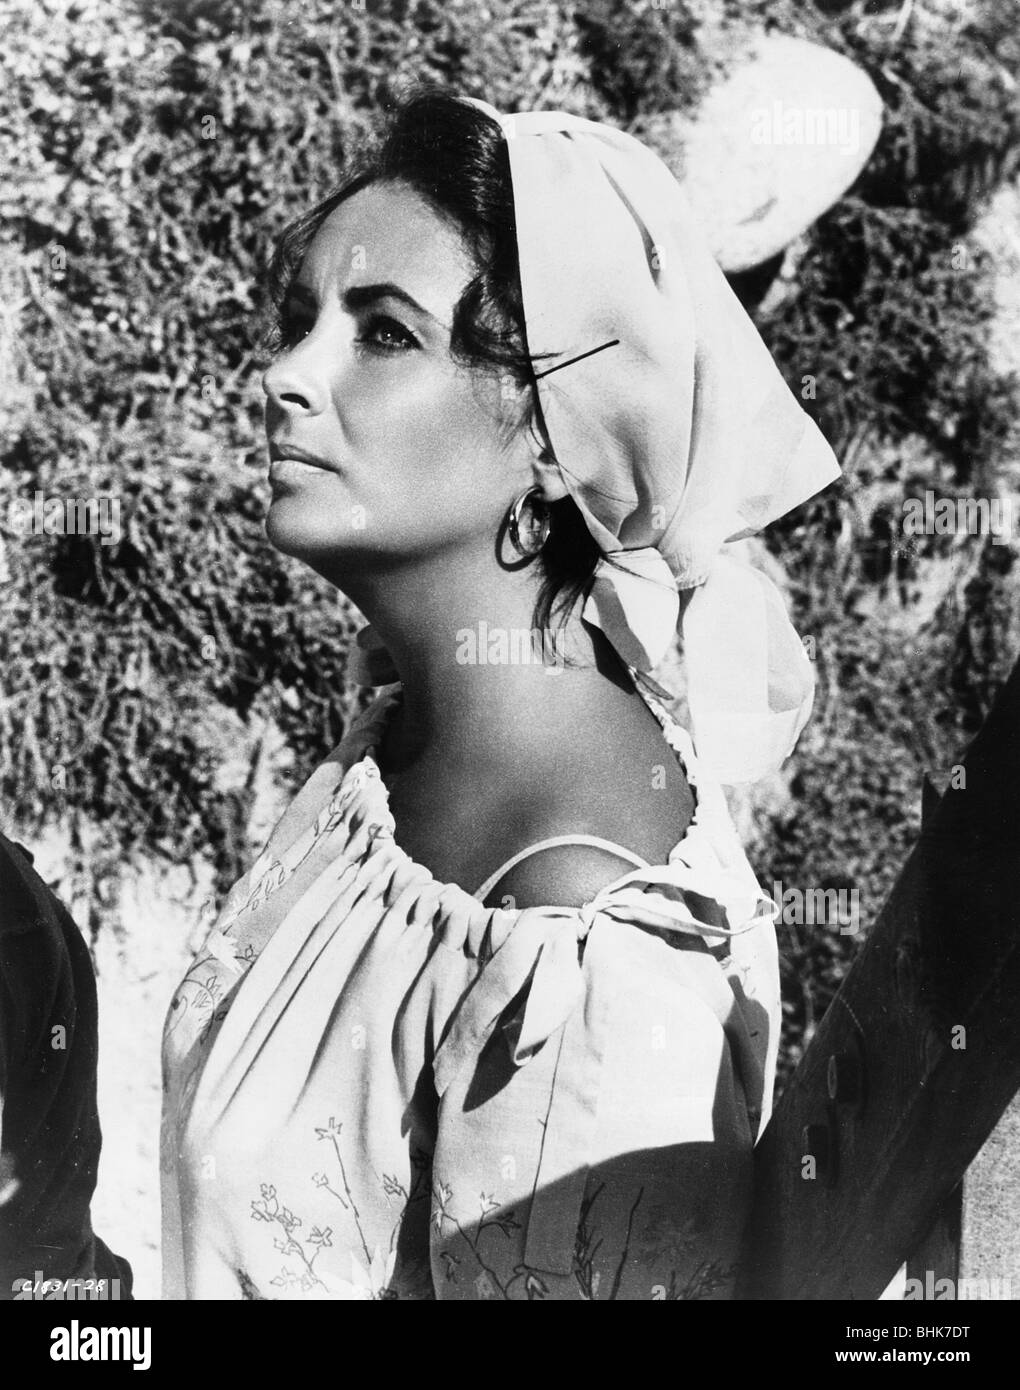 Elizabeth Taylor (1932-), British actress, 1965. - Stock Image